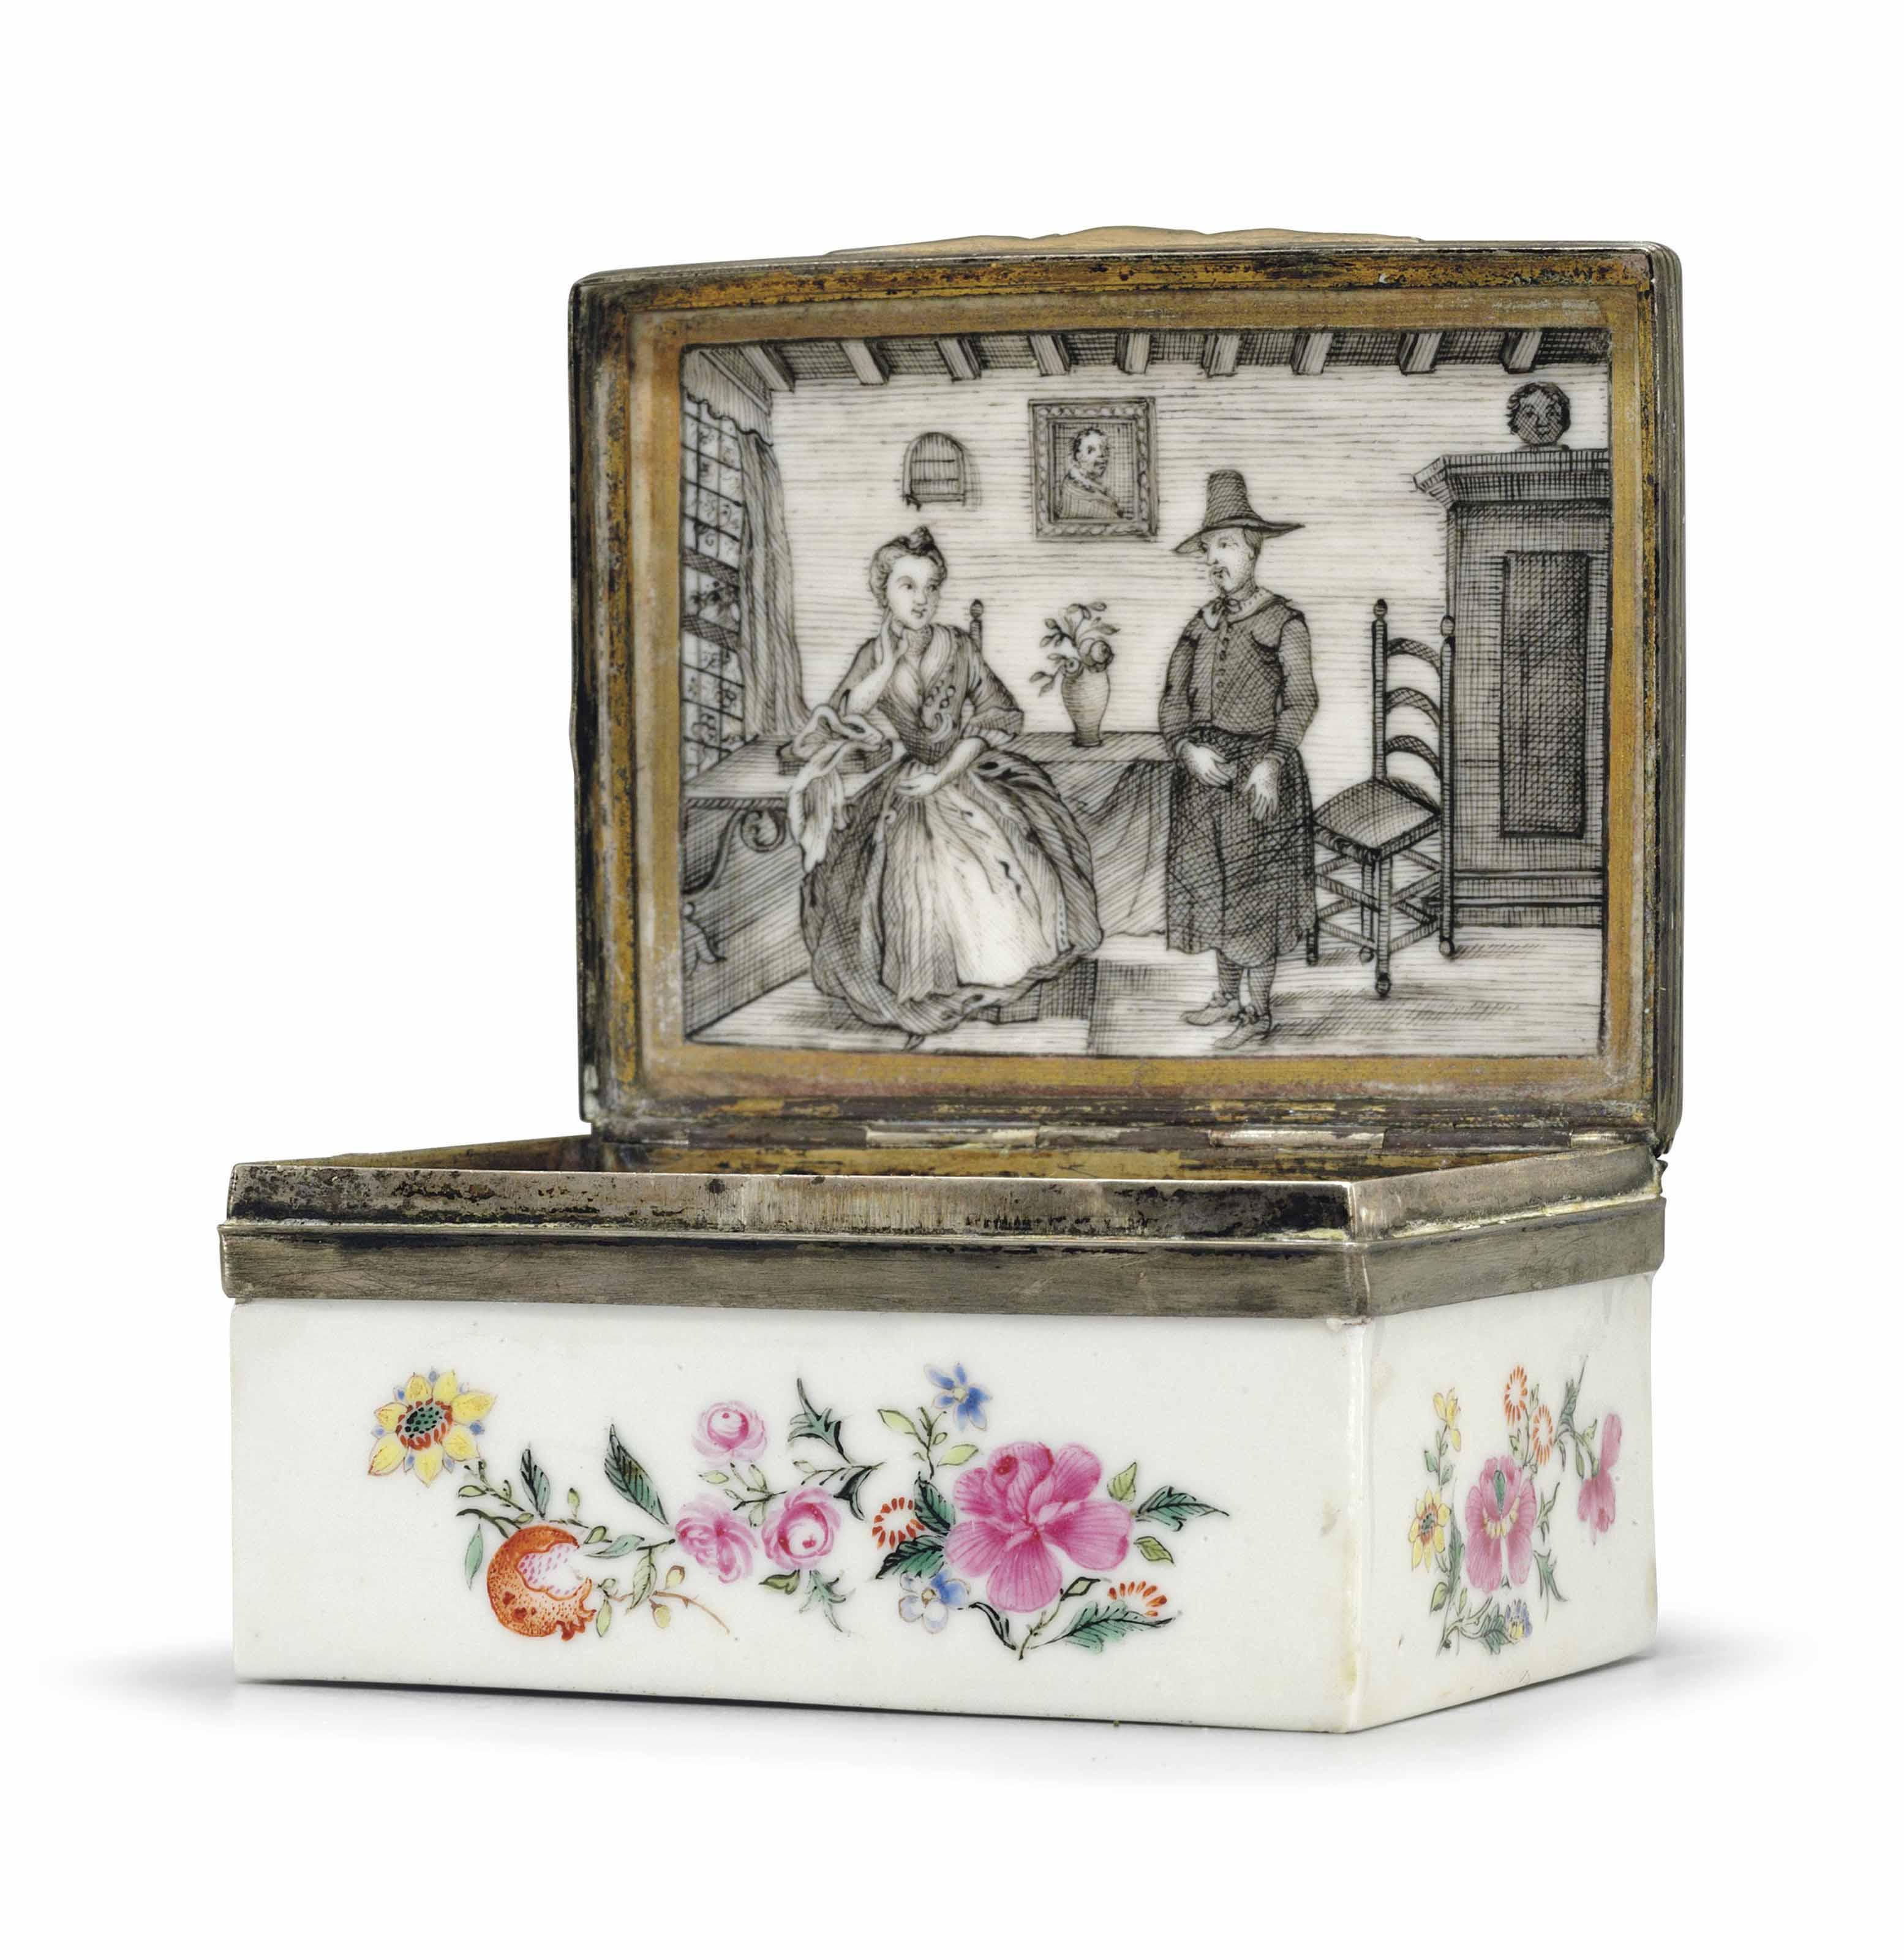 A FAMILLE ROSE PORCELAIN SNUFF BOX